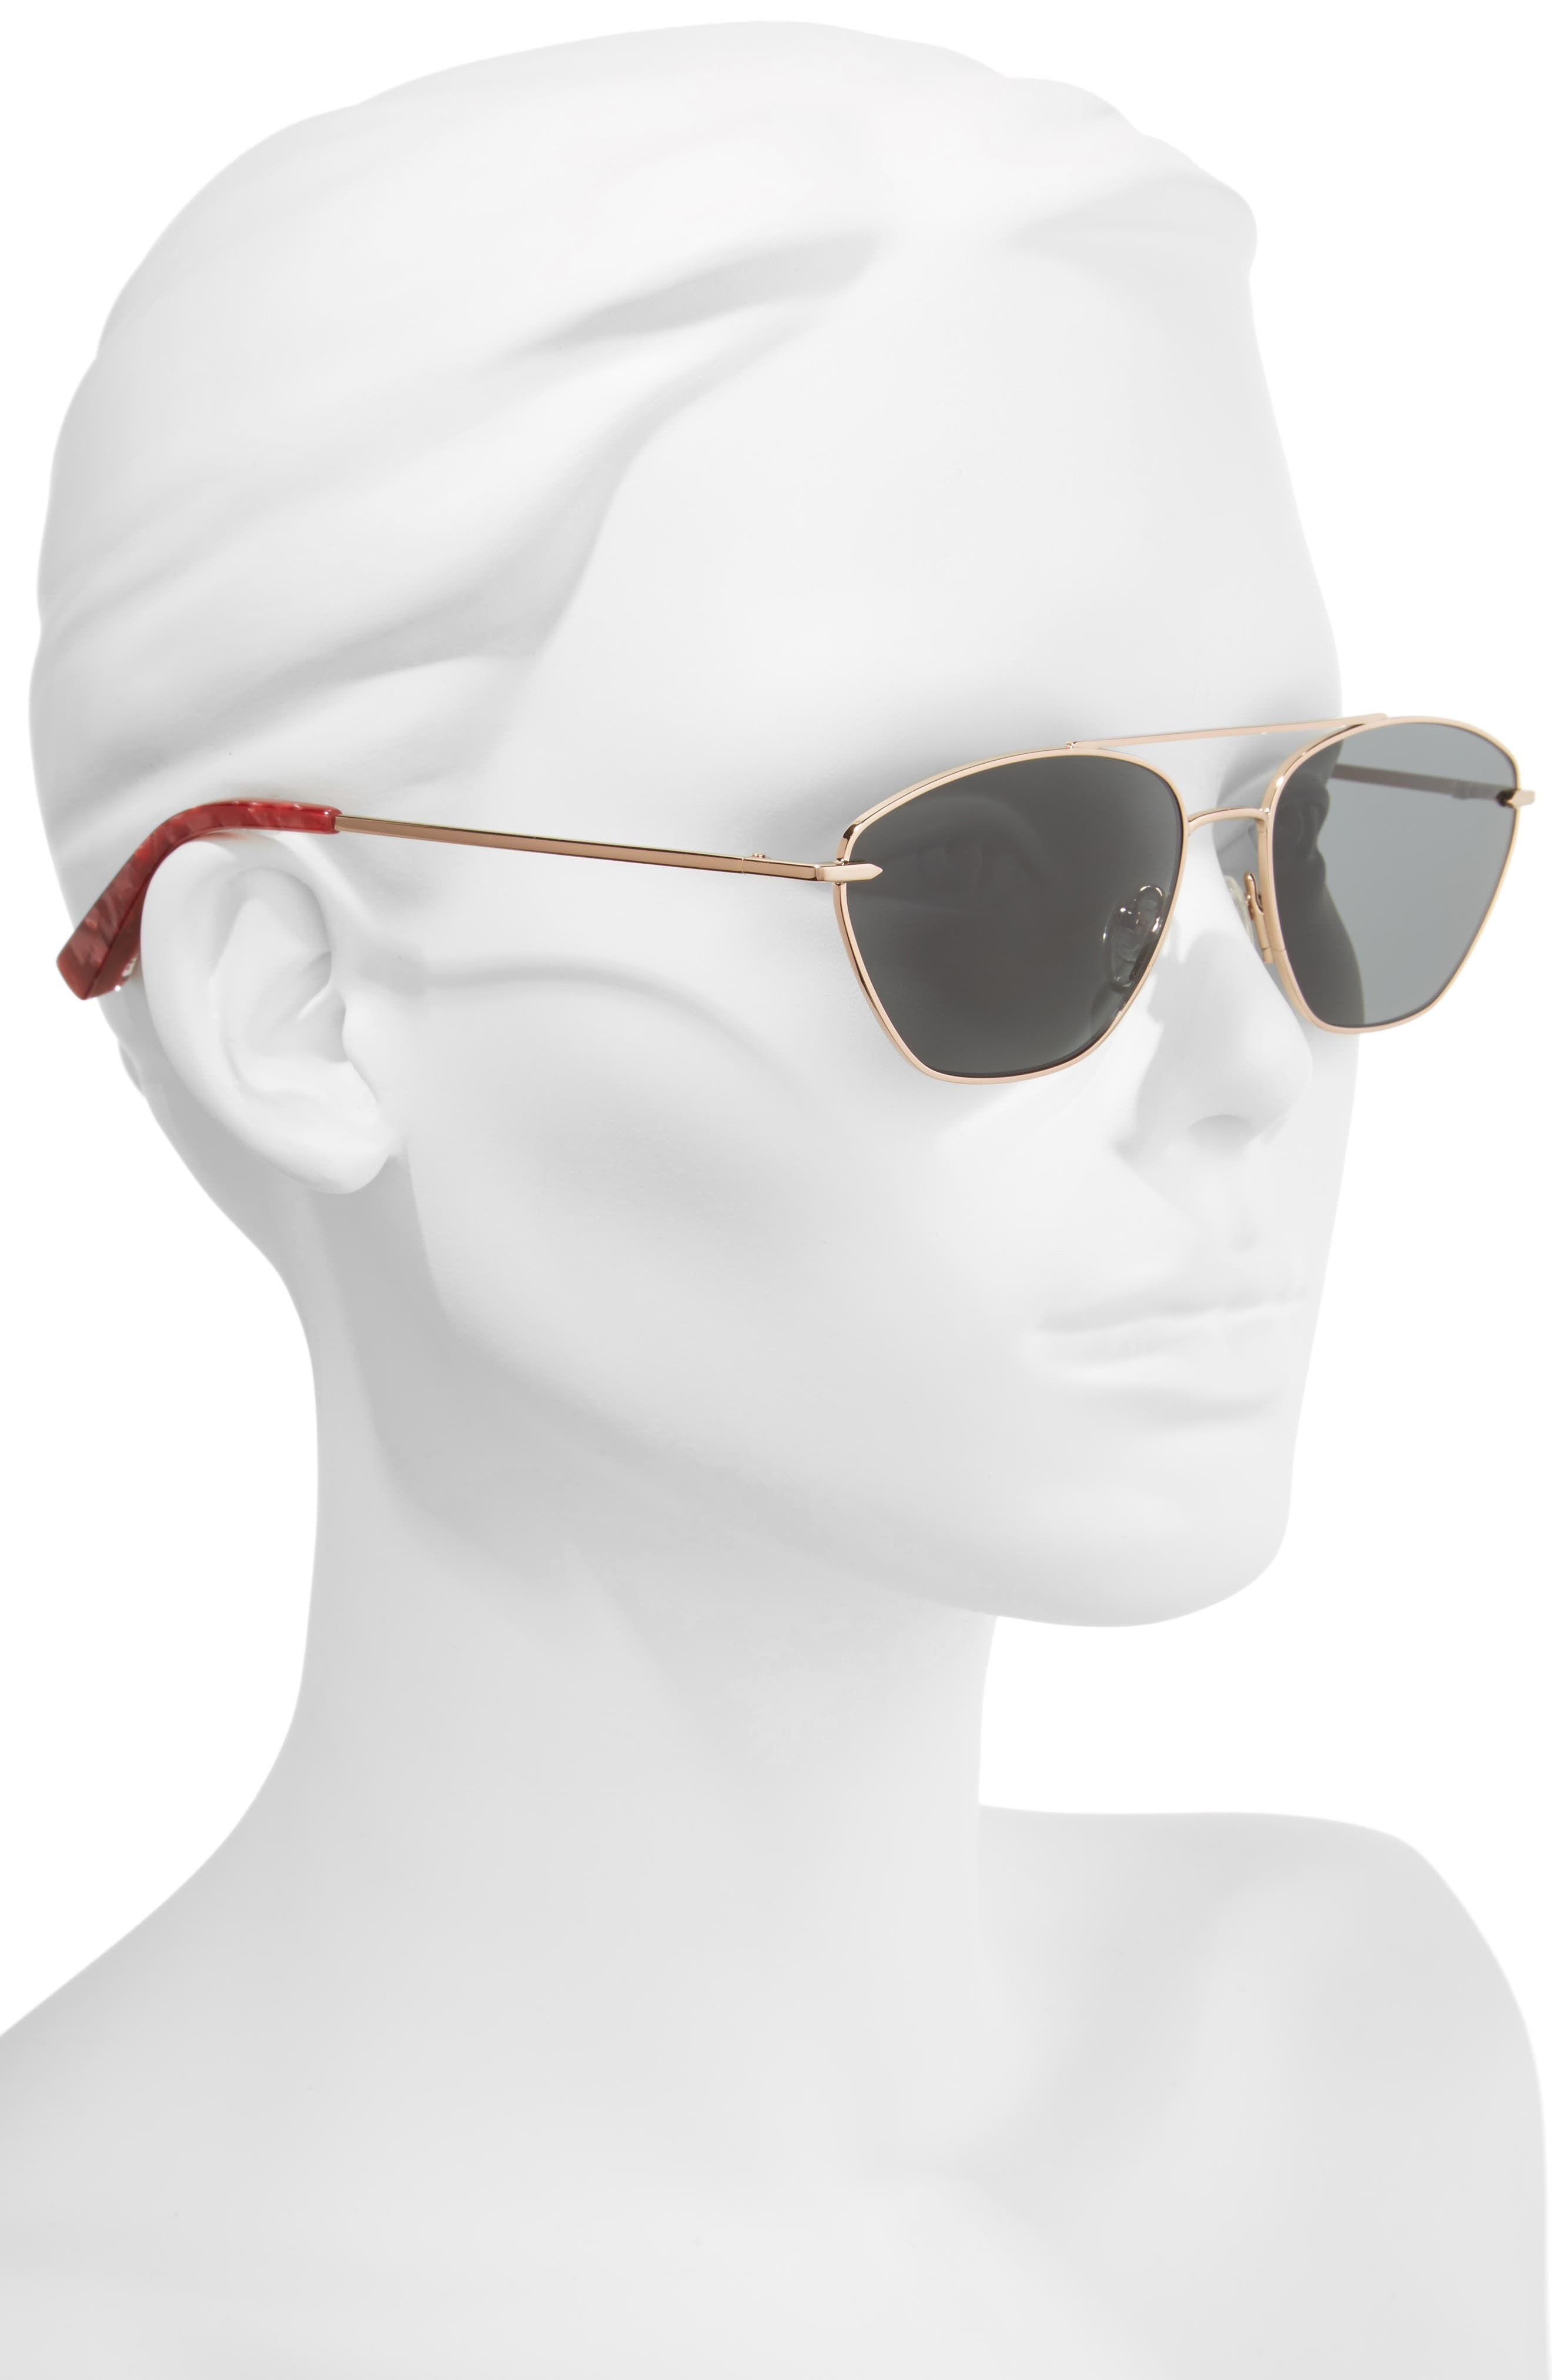 Johnson 56mm Navigator Sunglasses,                             Alternate thumbnail 2, color,                             Rose Gold/ Smoke